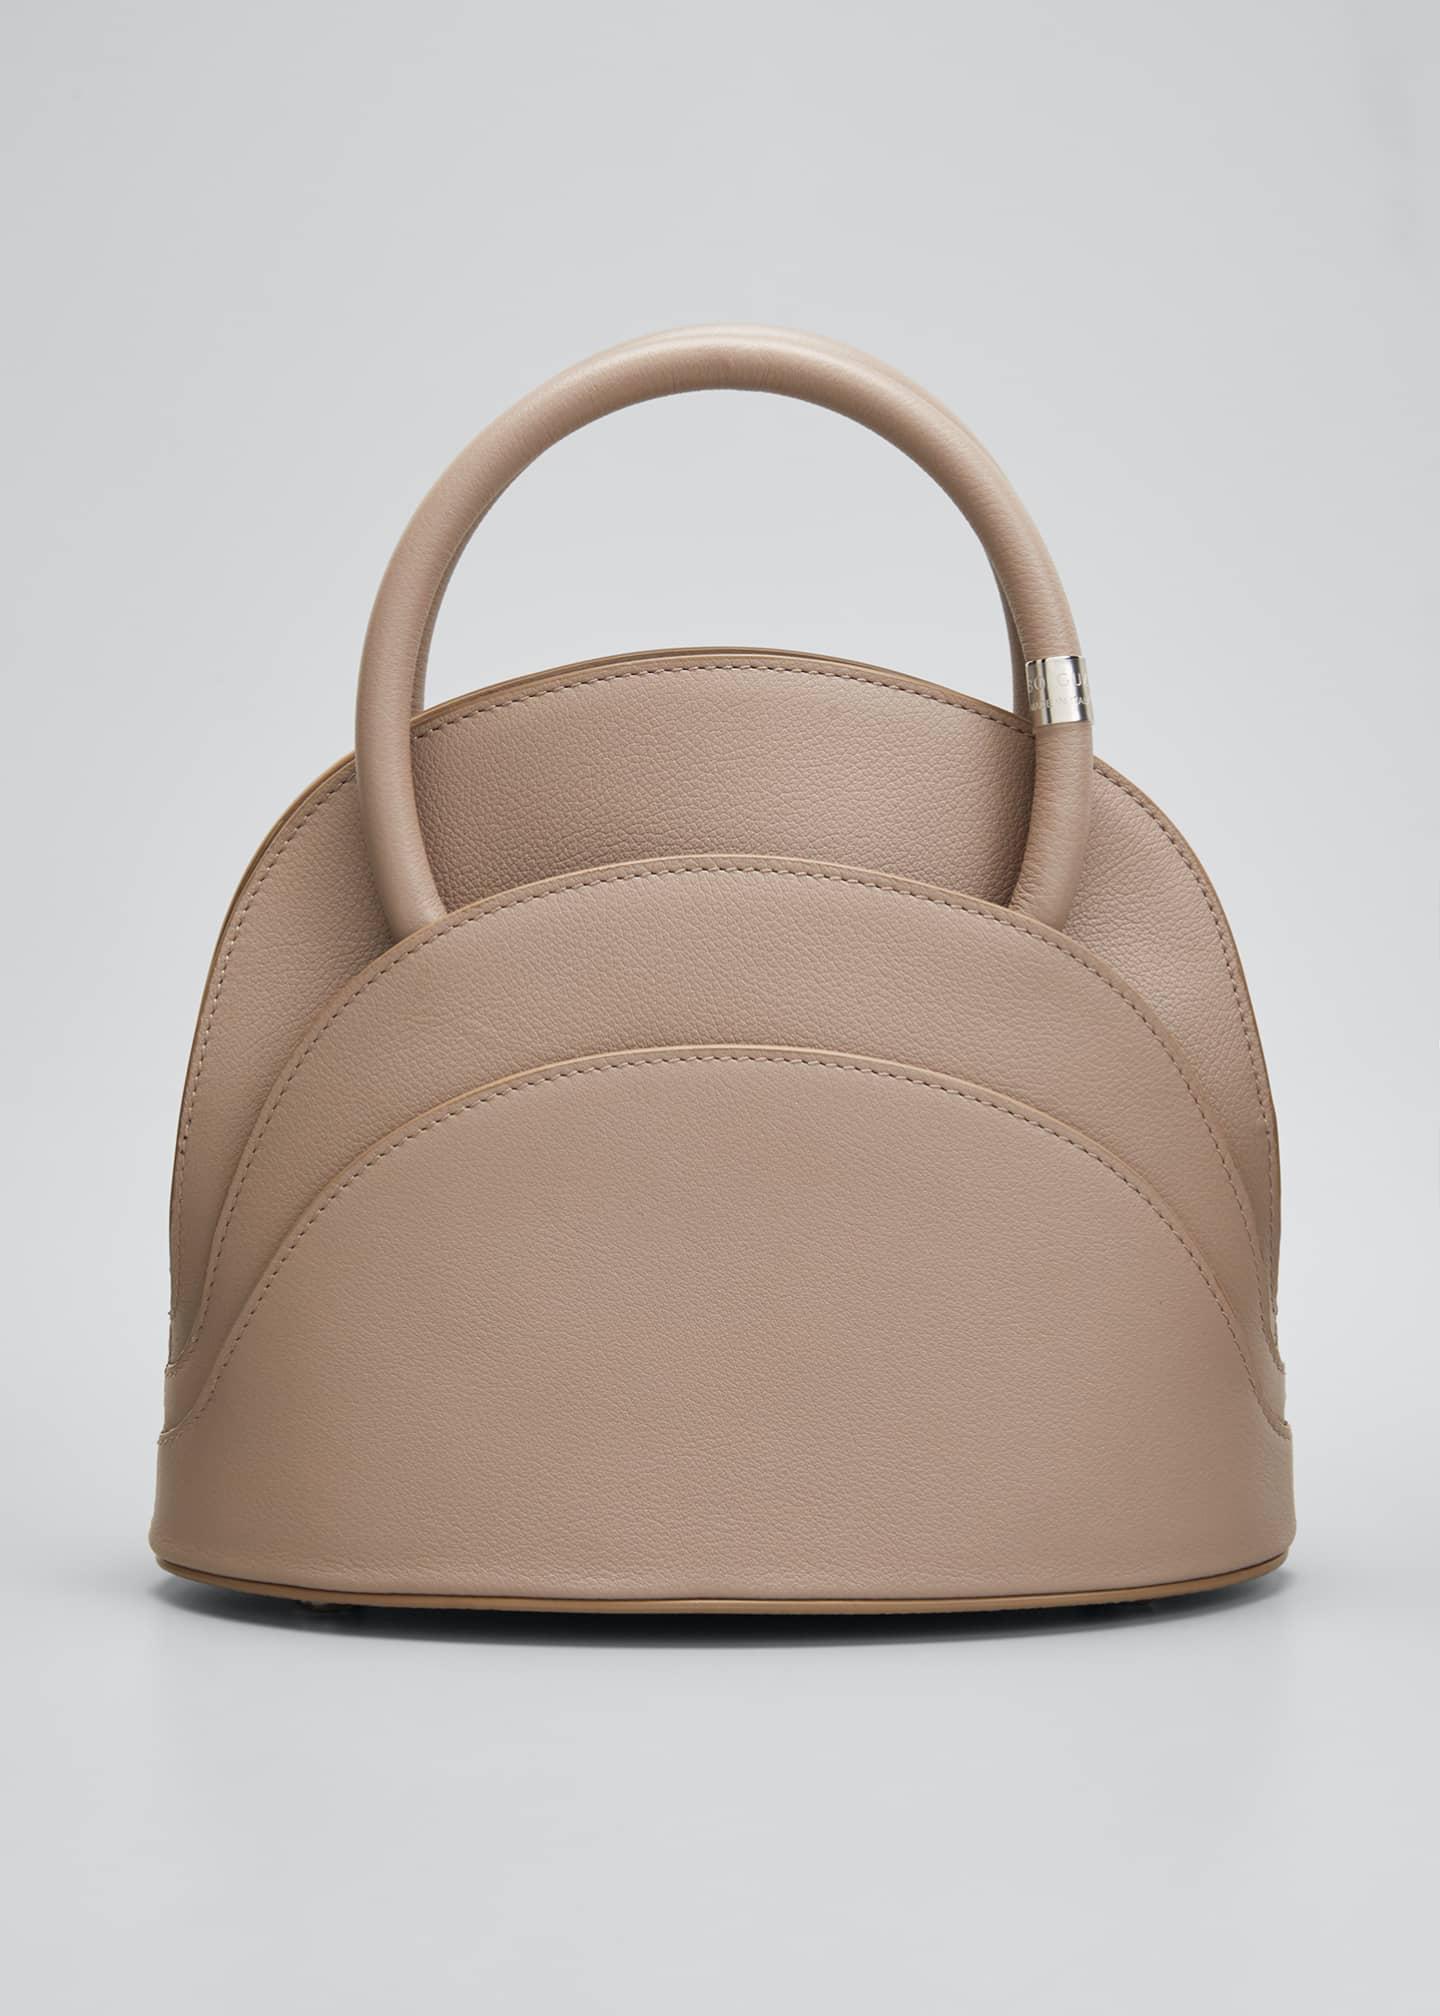 Gabo Guzzo Millefoglie Medium Layered Leather Top-Handle Bag